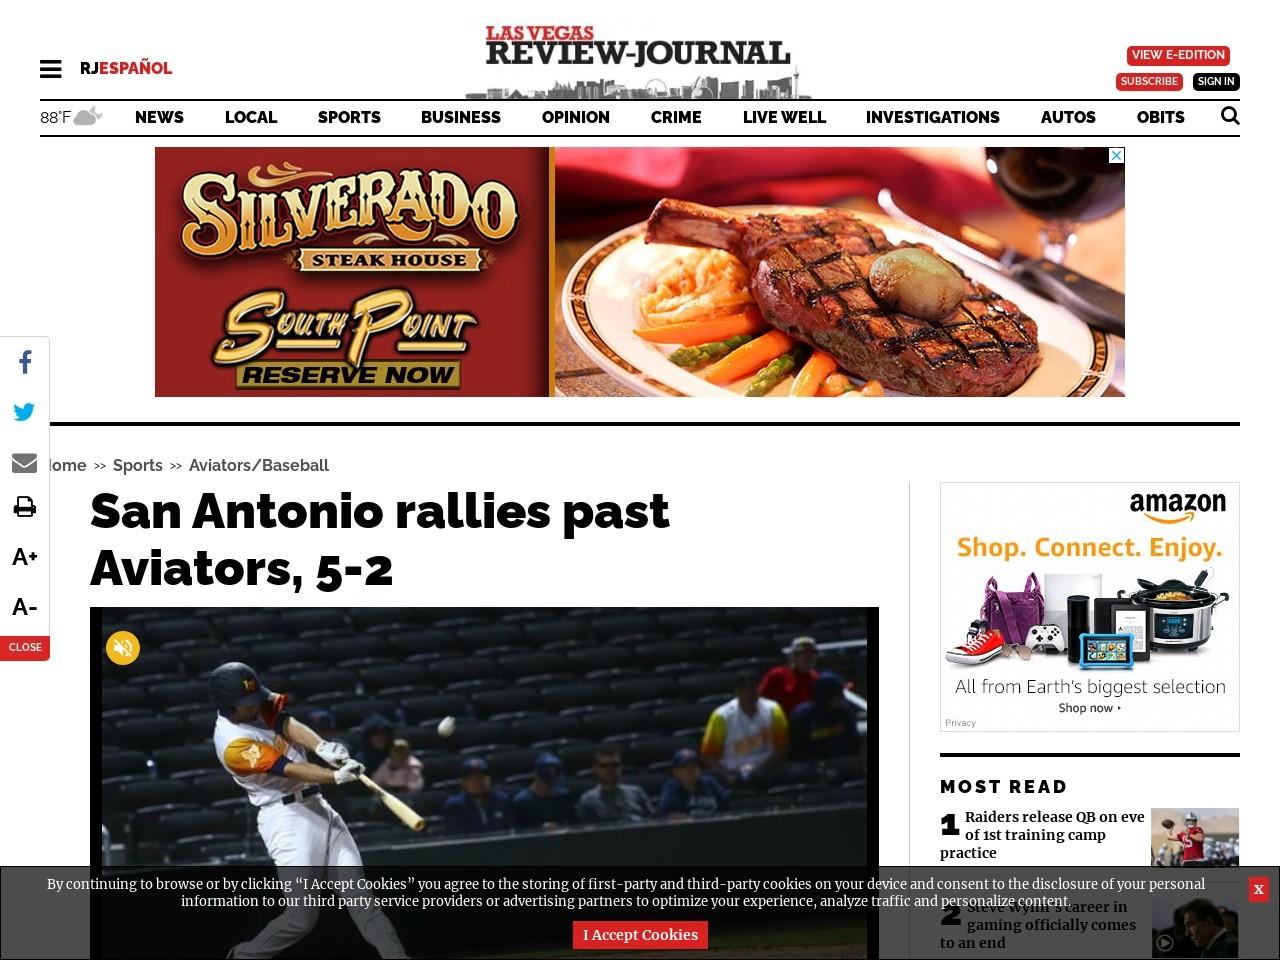 San Antonio rallies past Aviators, 5-2